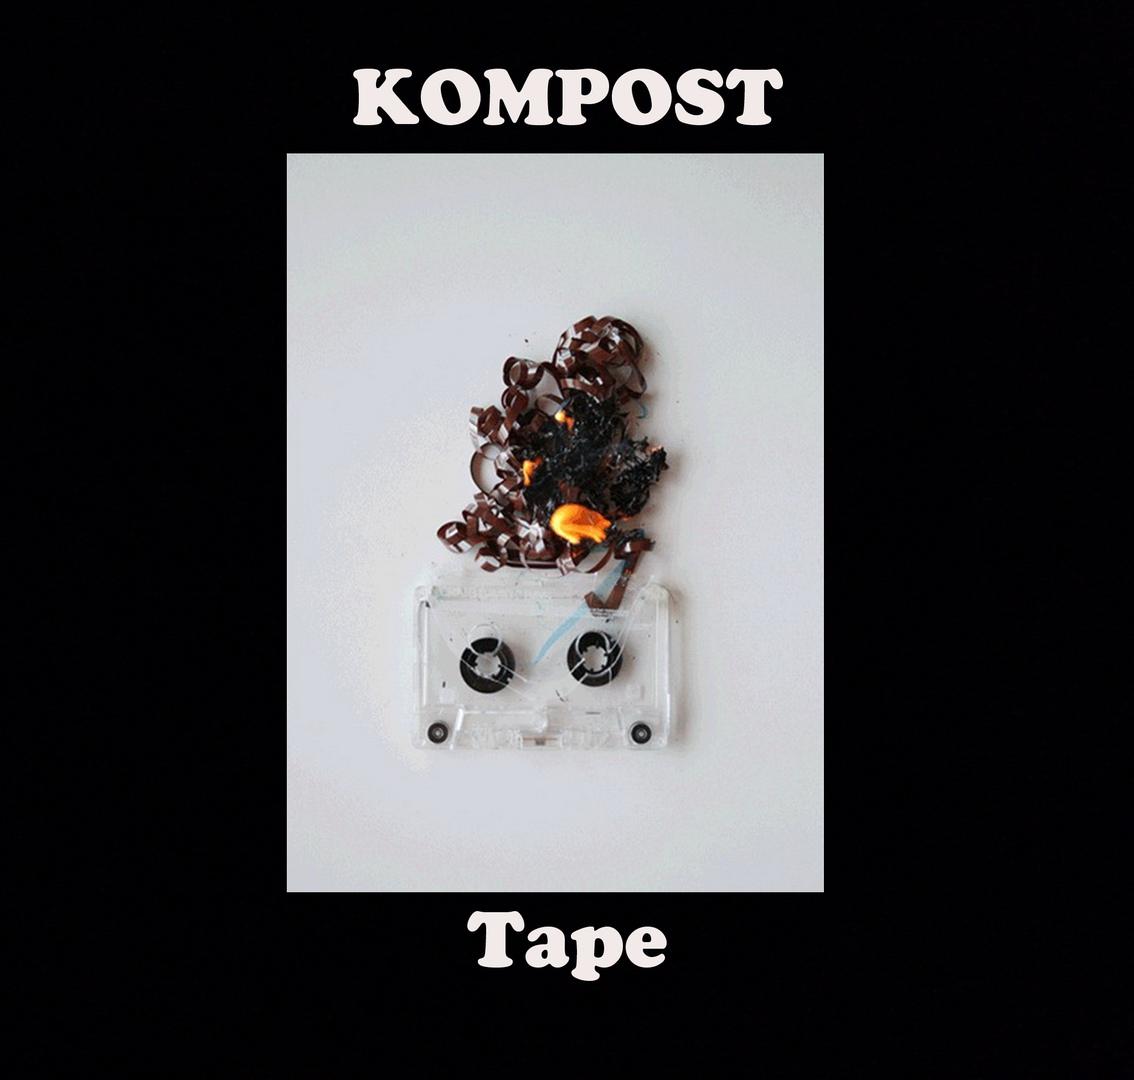 http://u.cubeupload.com/gothika/kompost.jpg